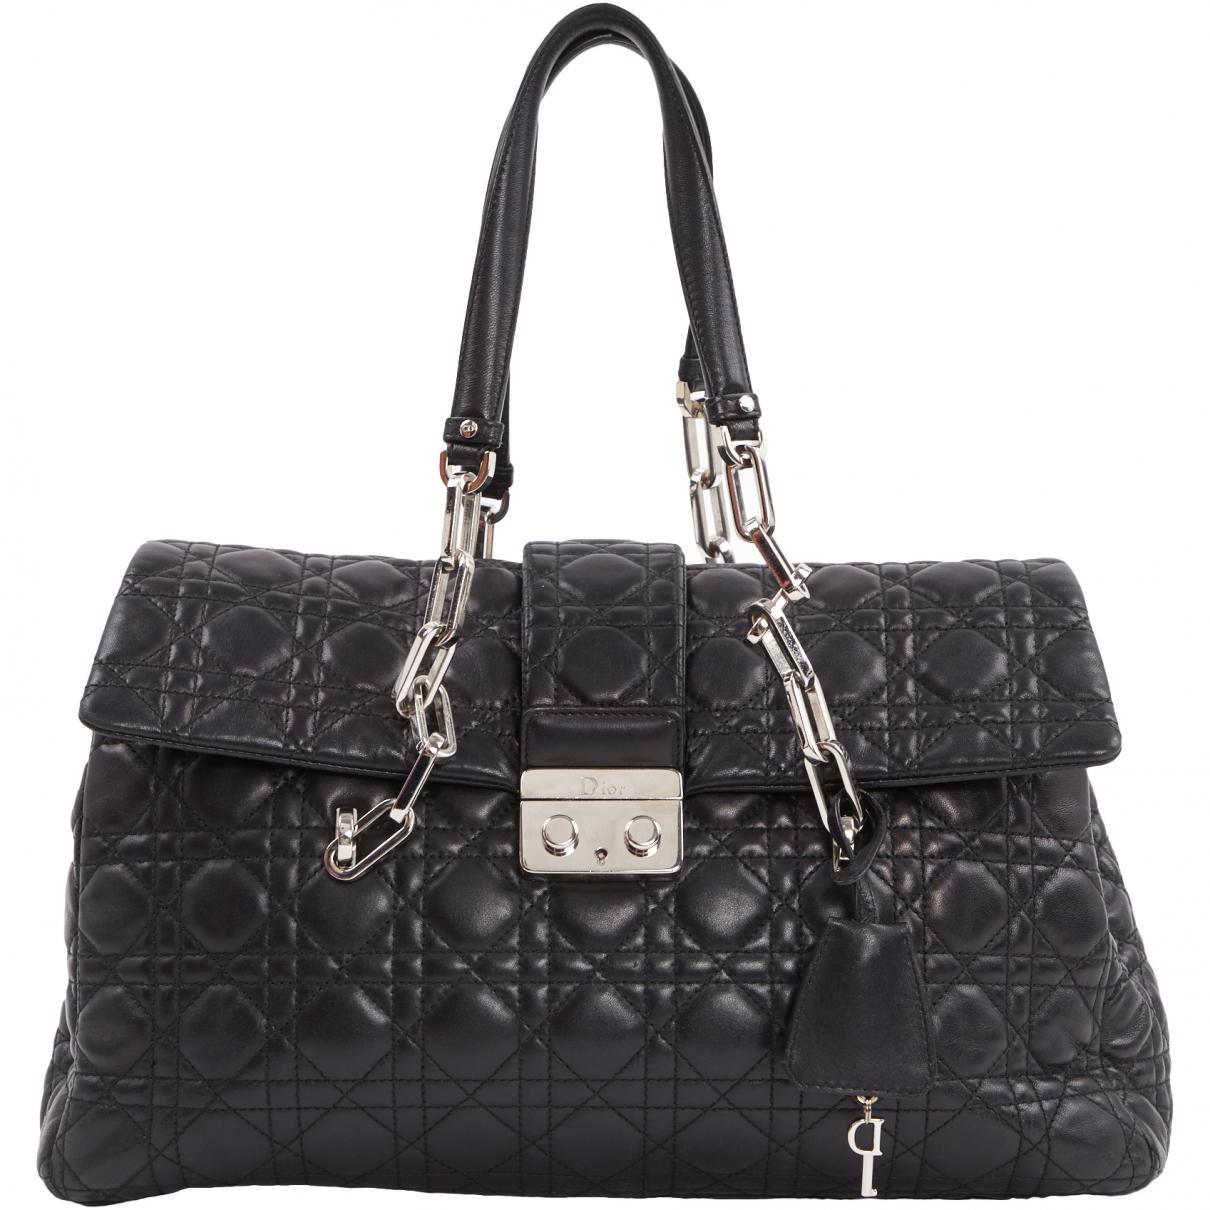 6217bbdce87 Dior Miss Leather Handbag in Black - Lyst